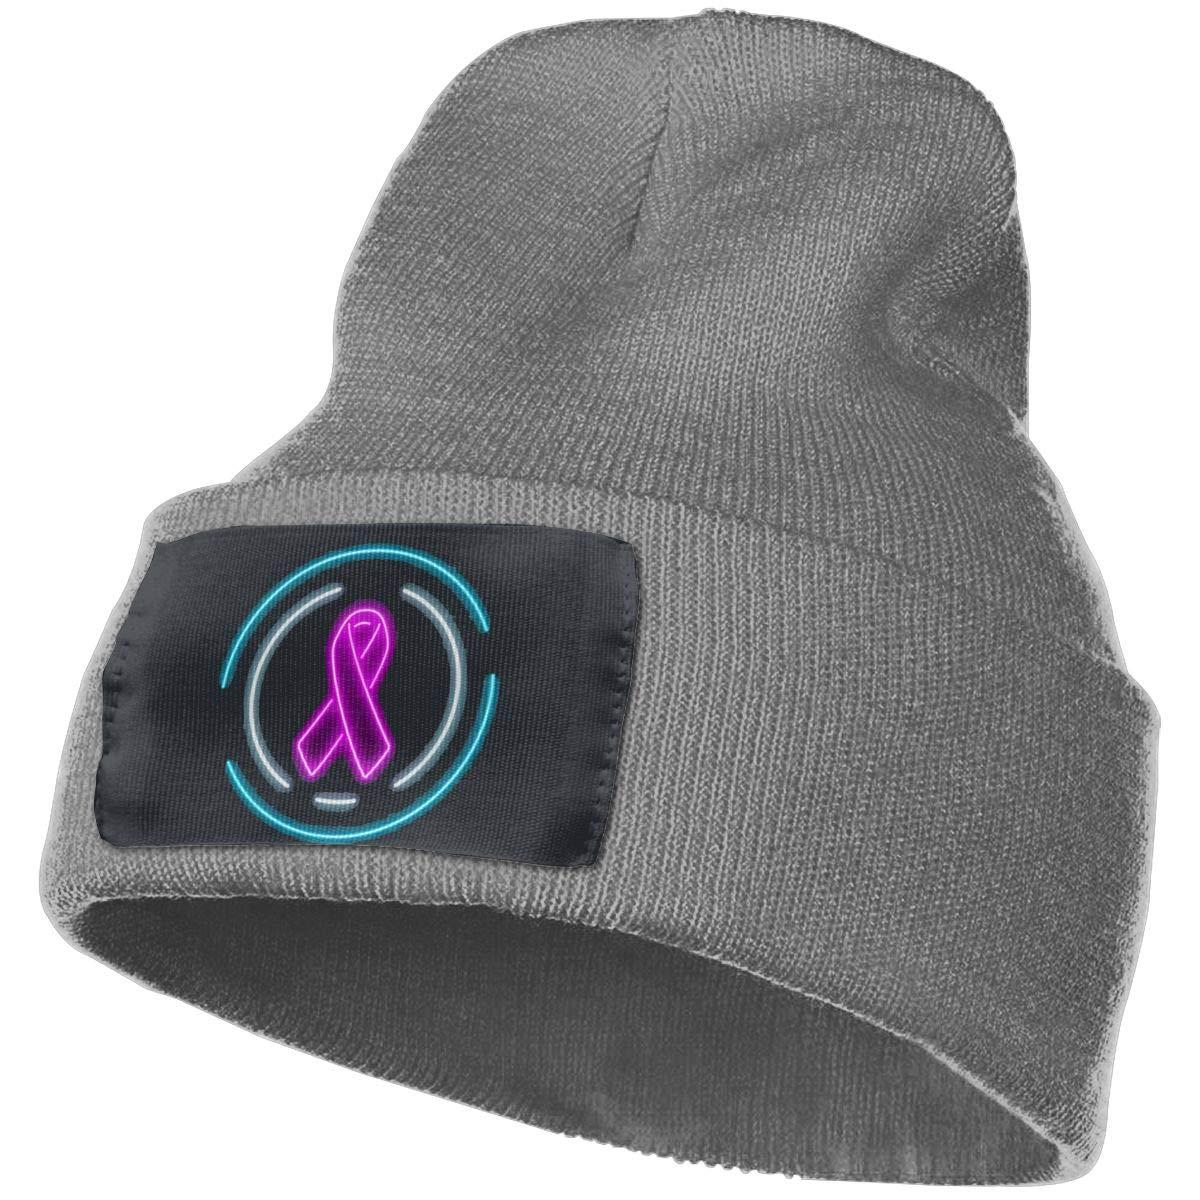 AgnWad Unisex Breast Cancer Ribbon Hope Knit Cap Soft Stretch Knit Hat Cap Winter Warmer Knit Cap Winter Warm Knitting Hats